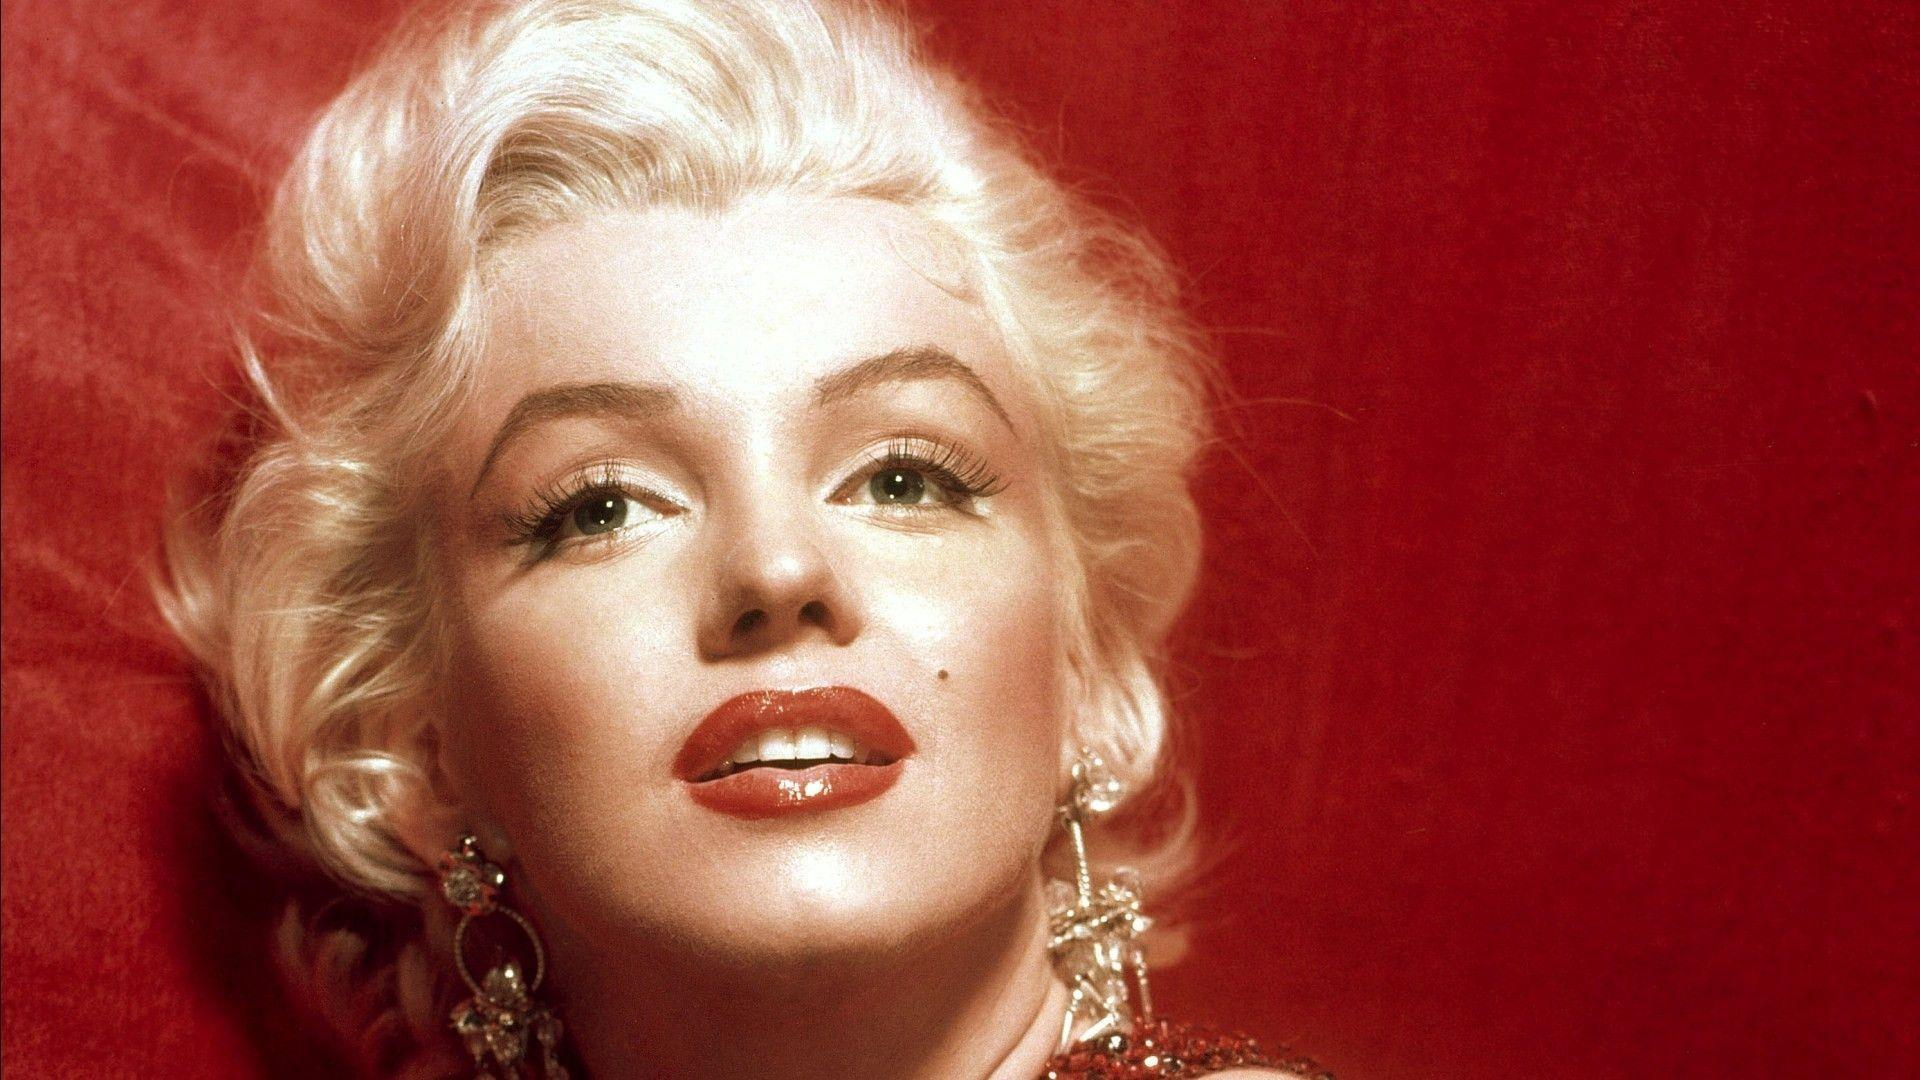 Wallpaper HD: marilyn monroe wallpapers Marilyn Monroe Wallpapers ...